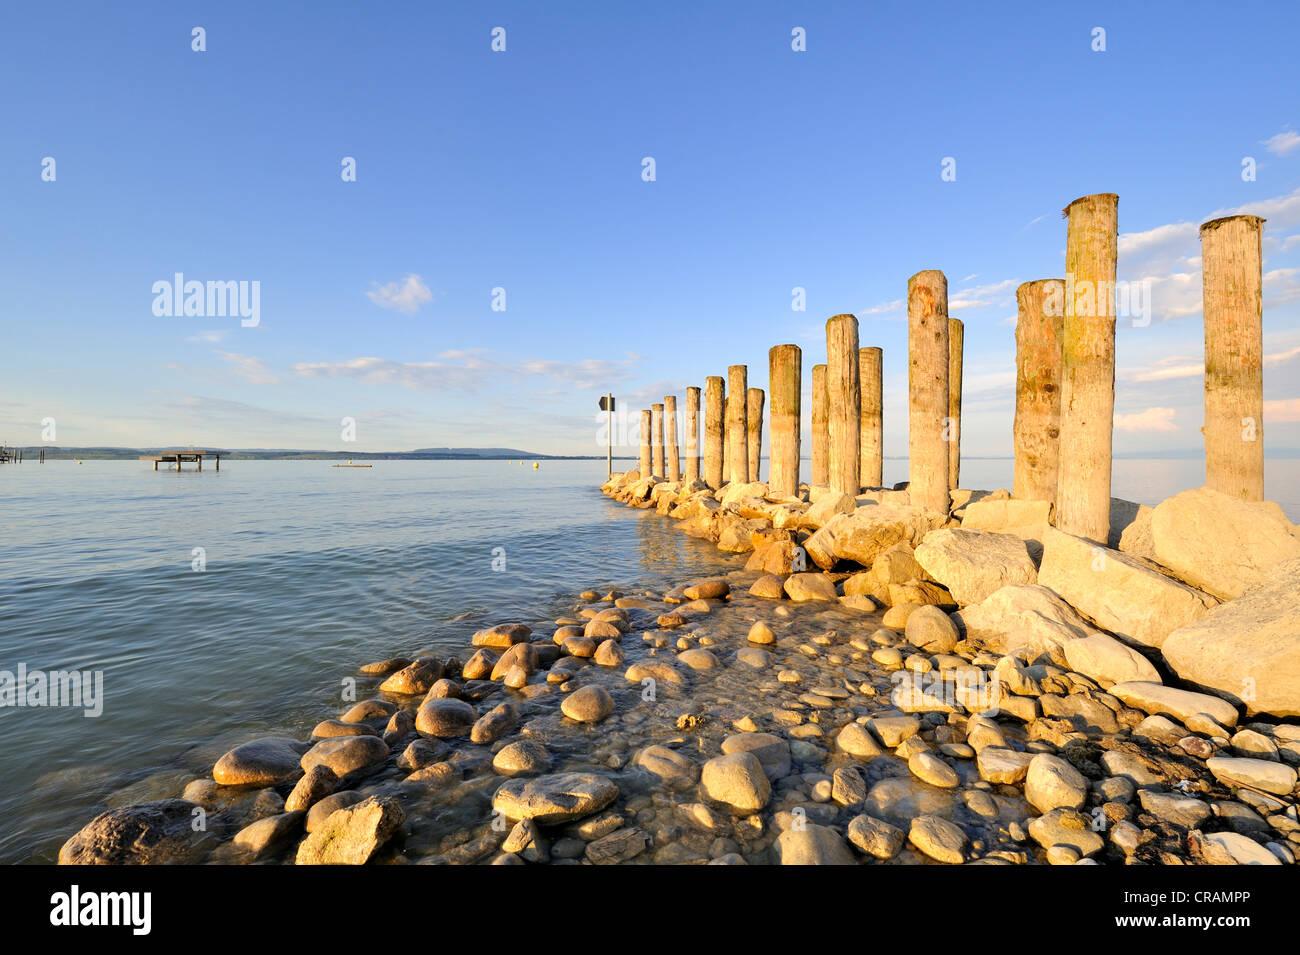 Breakwaters on the shore of Lake Constance, Altnau, Canton Thurgau, Switzerland, Europe - Stock Image